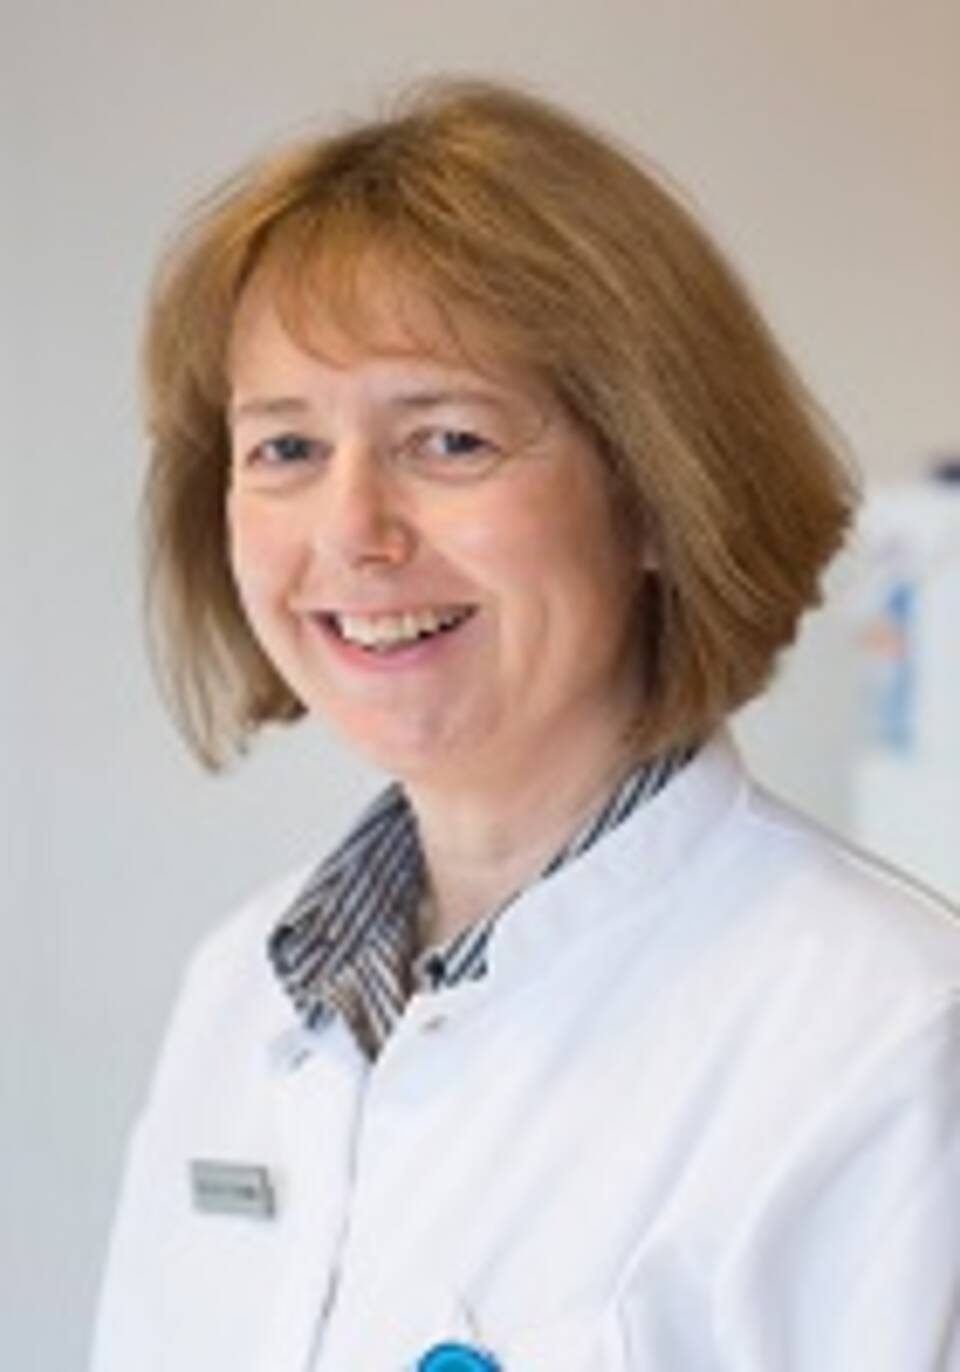 Allergologin Prof. Regine Treudler